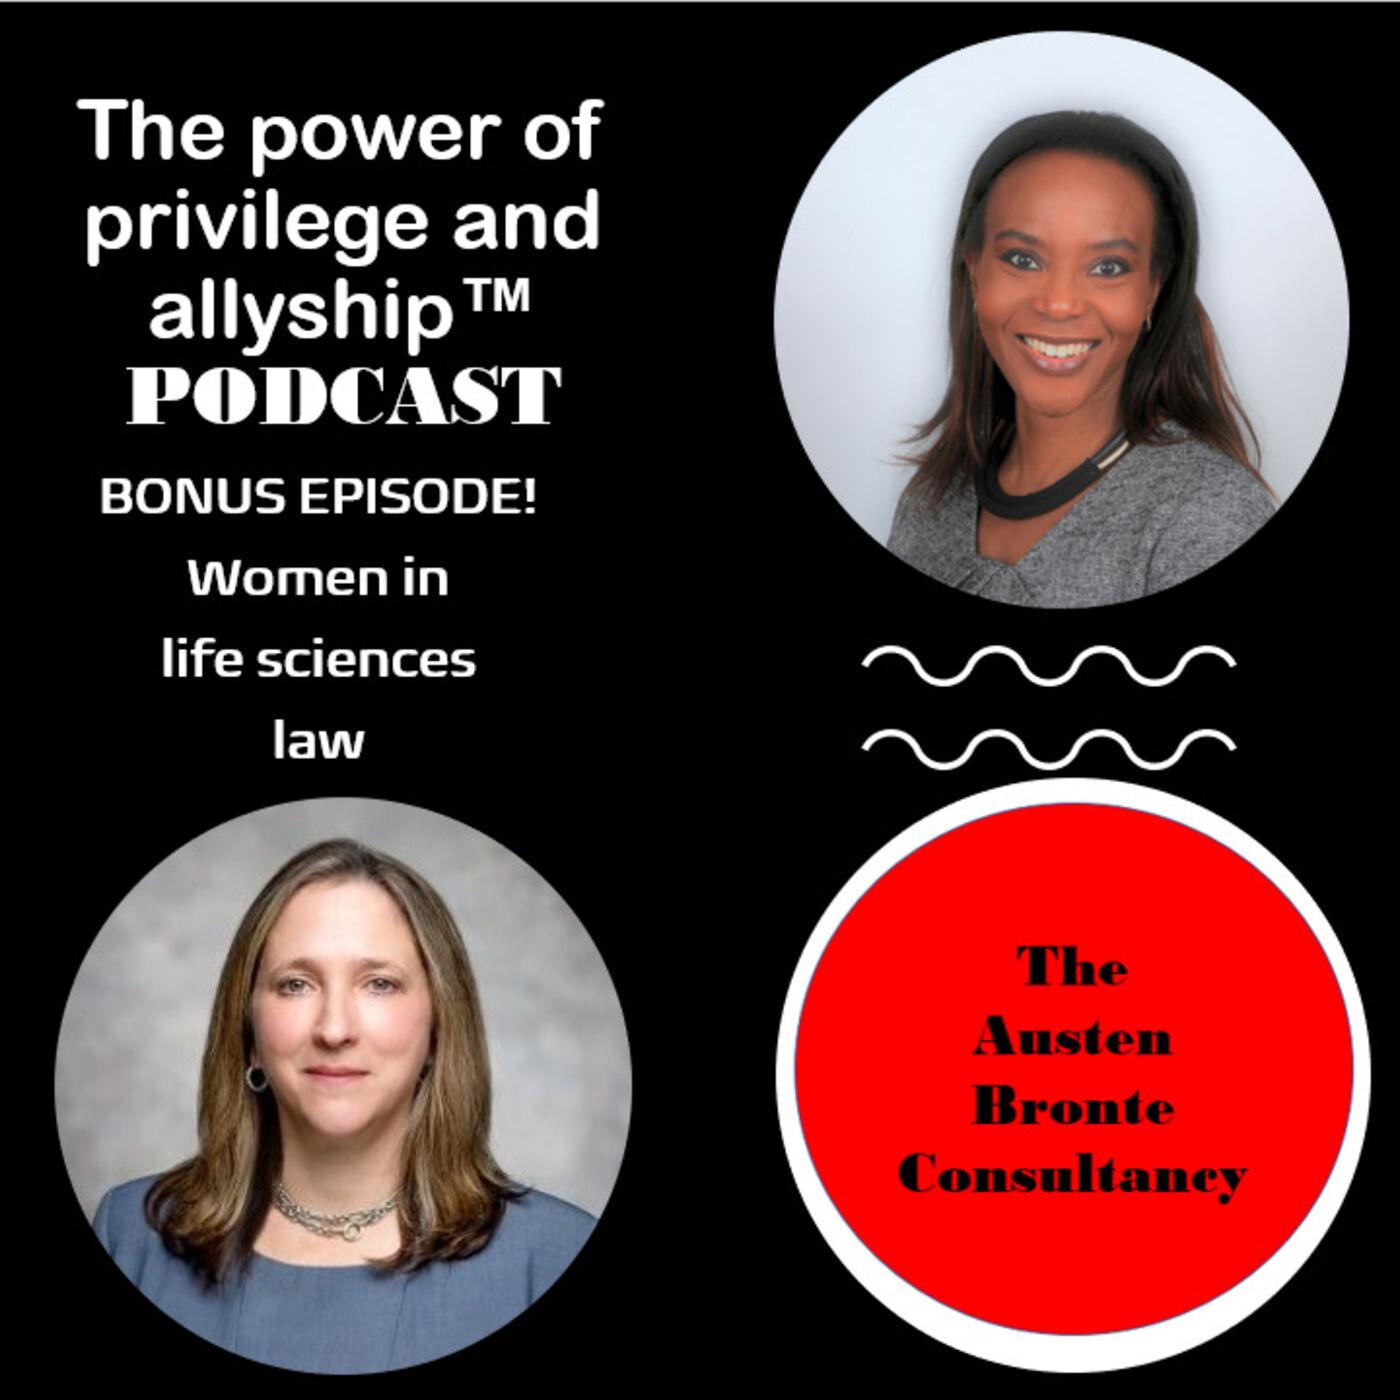 S1 BONUS EPISODE: Women in life sciences law feat. Diane Lifton